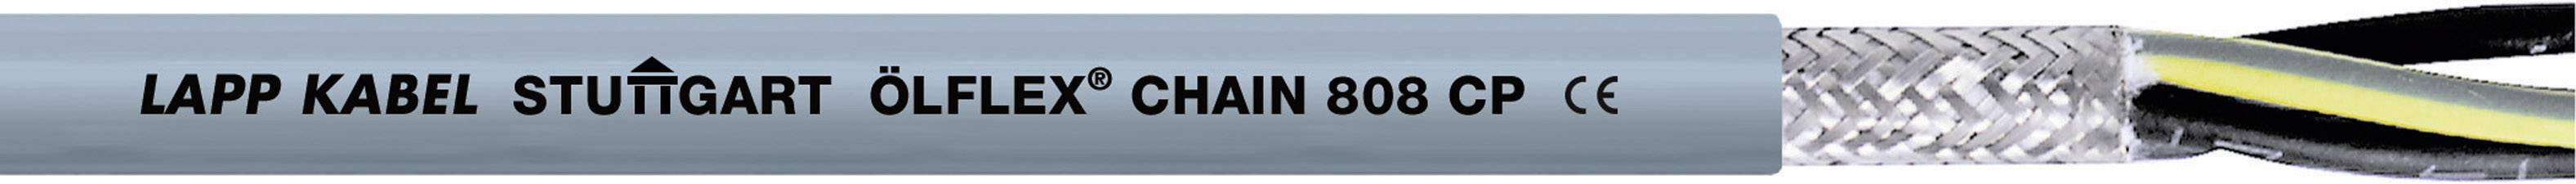 Žíla kabelu LappKabel ÖLFLEX CHAIN 808 CP 5G1,5 (1027778), 5x 1,5 mm², polyurethan, Ø 9,1 mm, stíněný, 100 m,